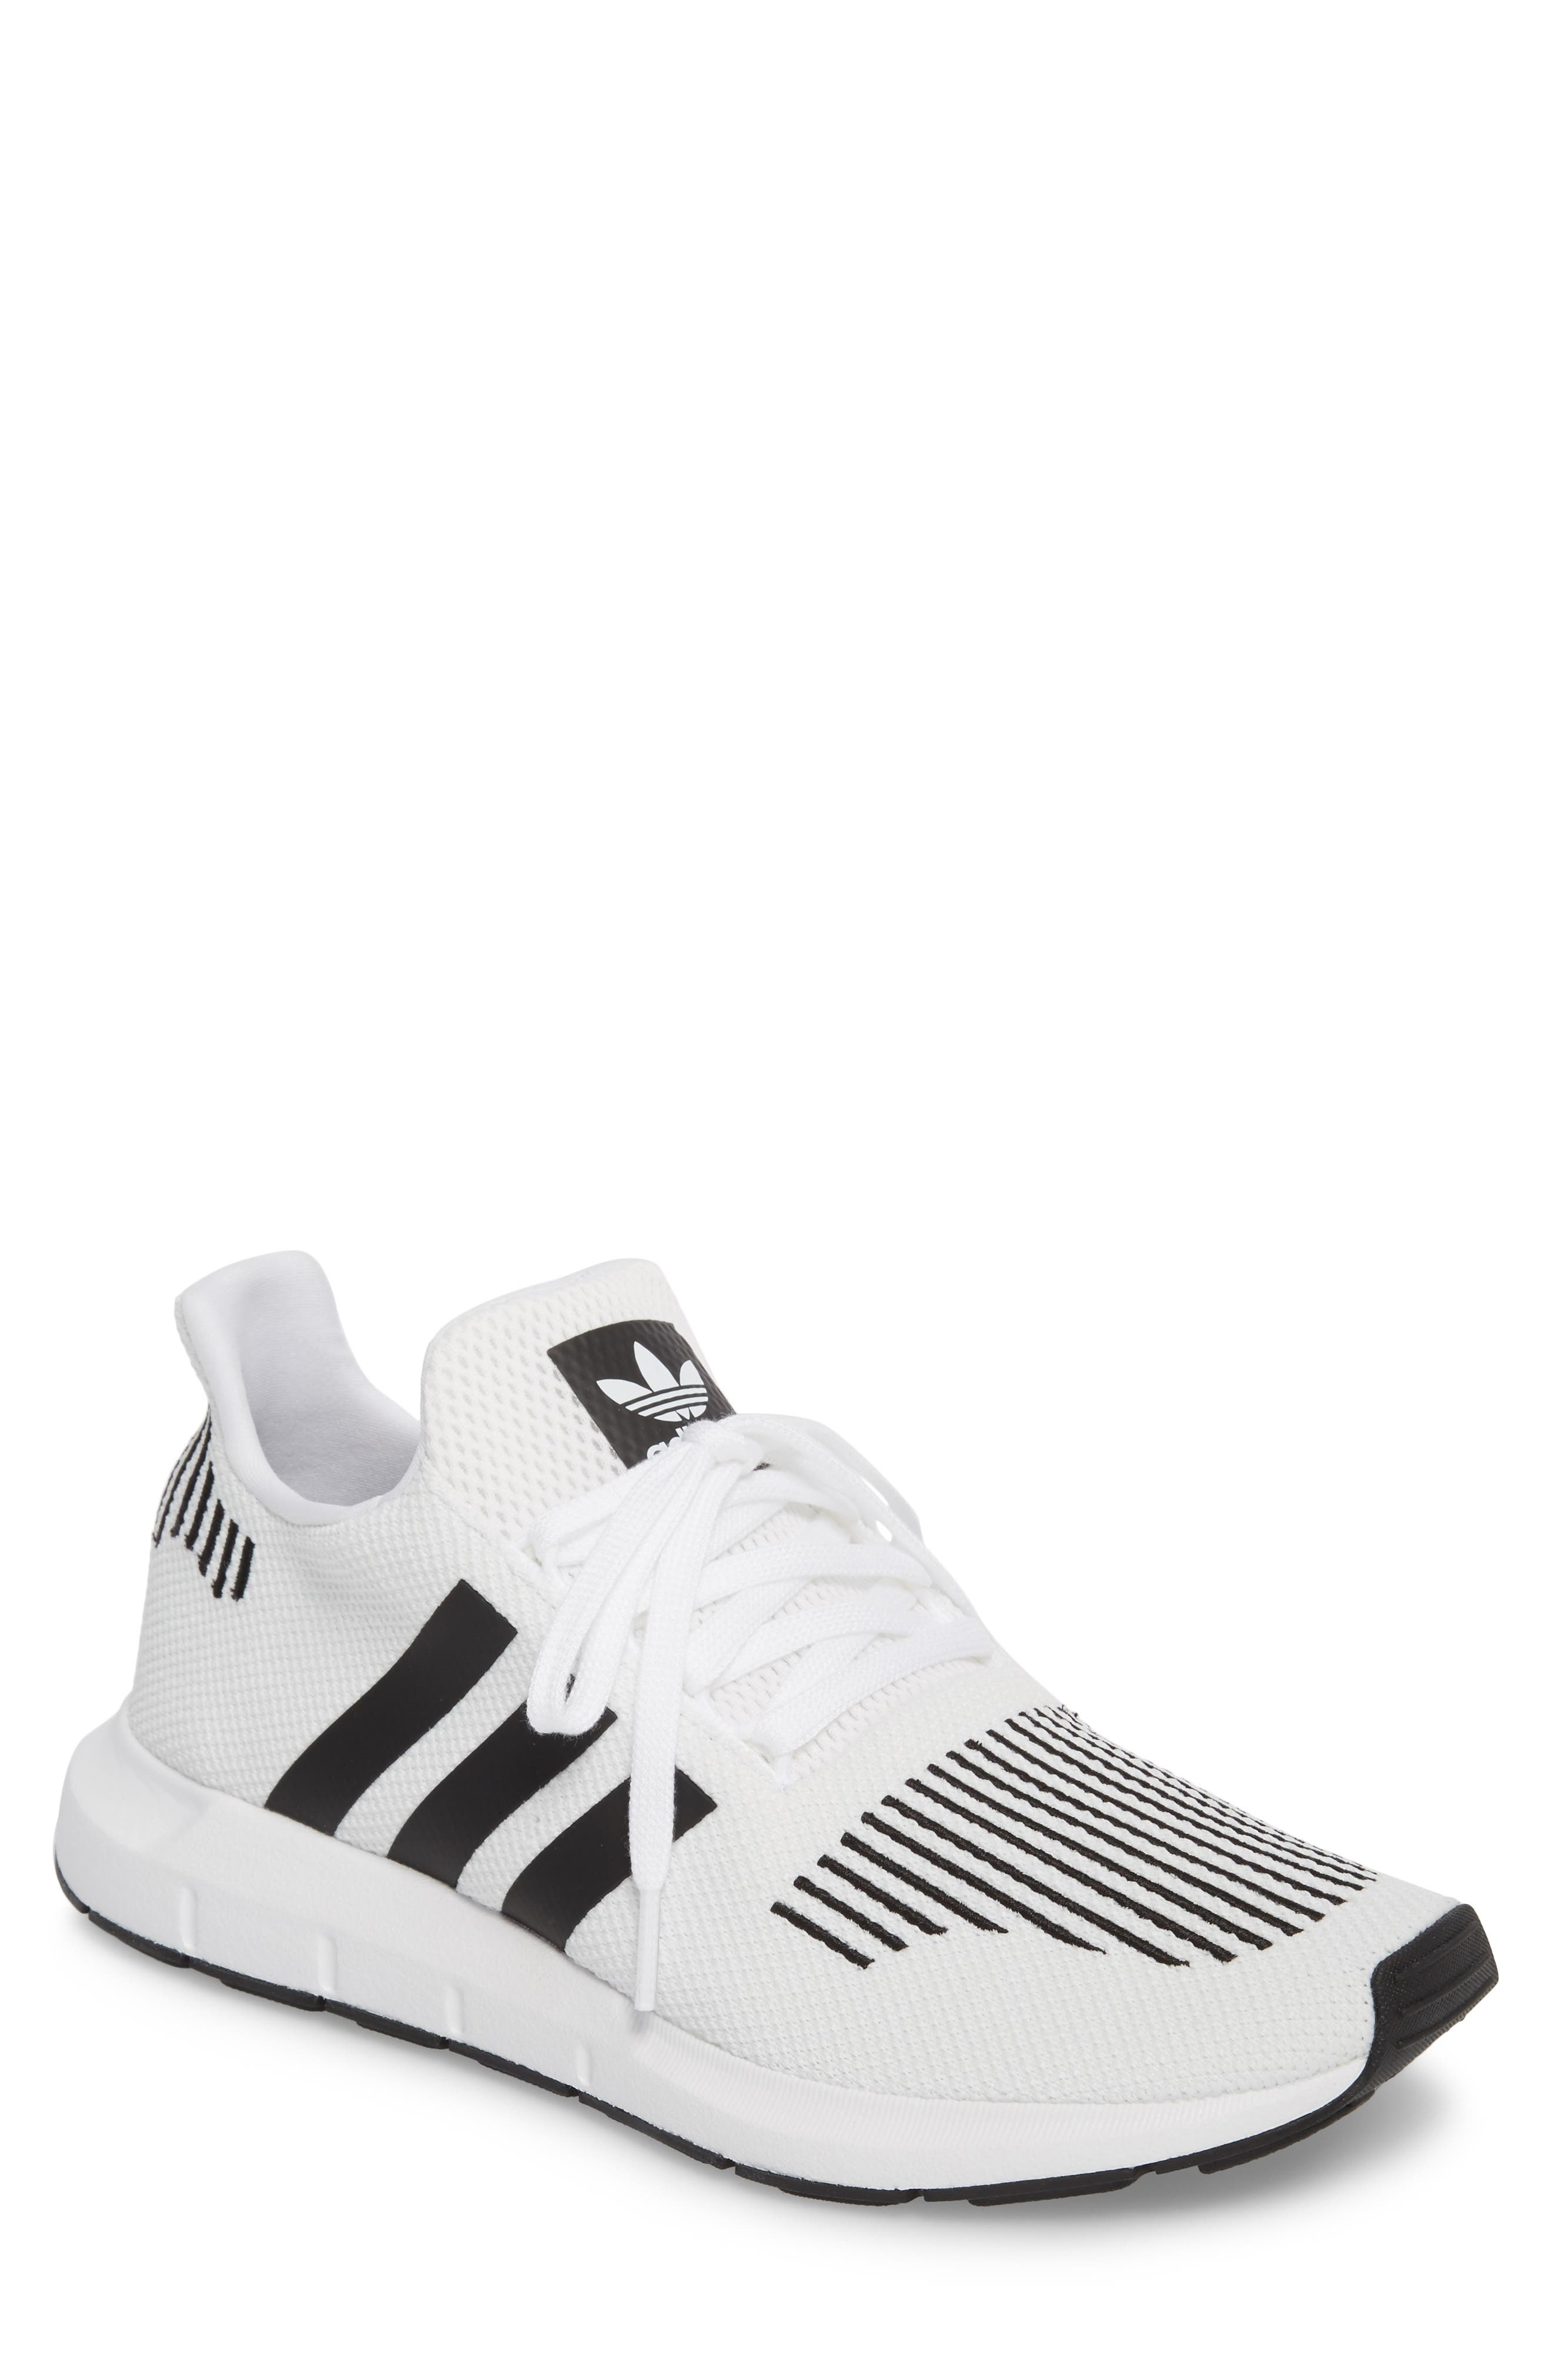 Main Image - adidas Swift Run Sneaker (Men)